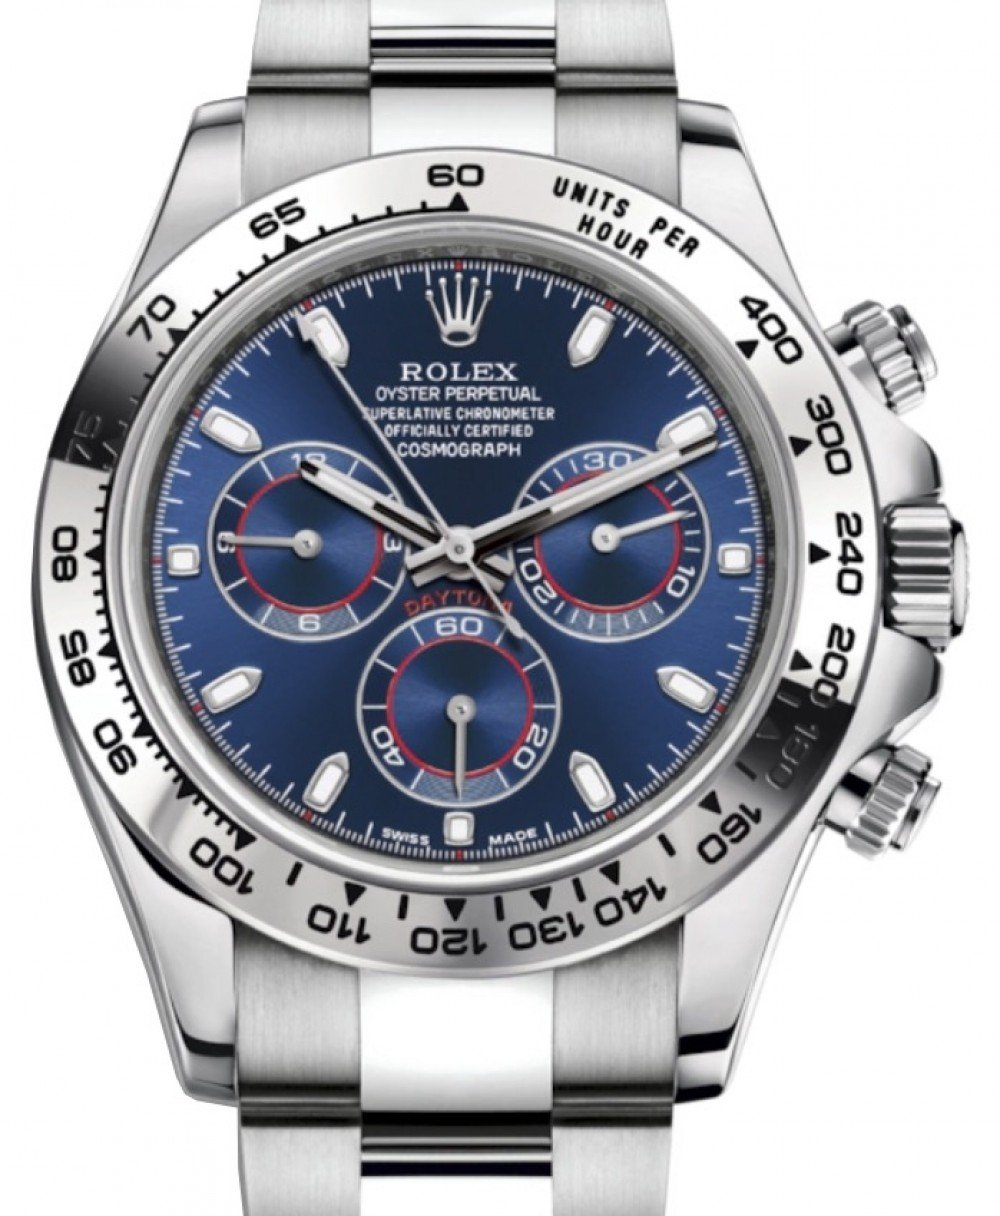 Rolex Daytona White Gold Blue Index Dial White Gold Bezel Oyster Bracelet  116509 , BRAND NEW